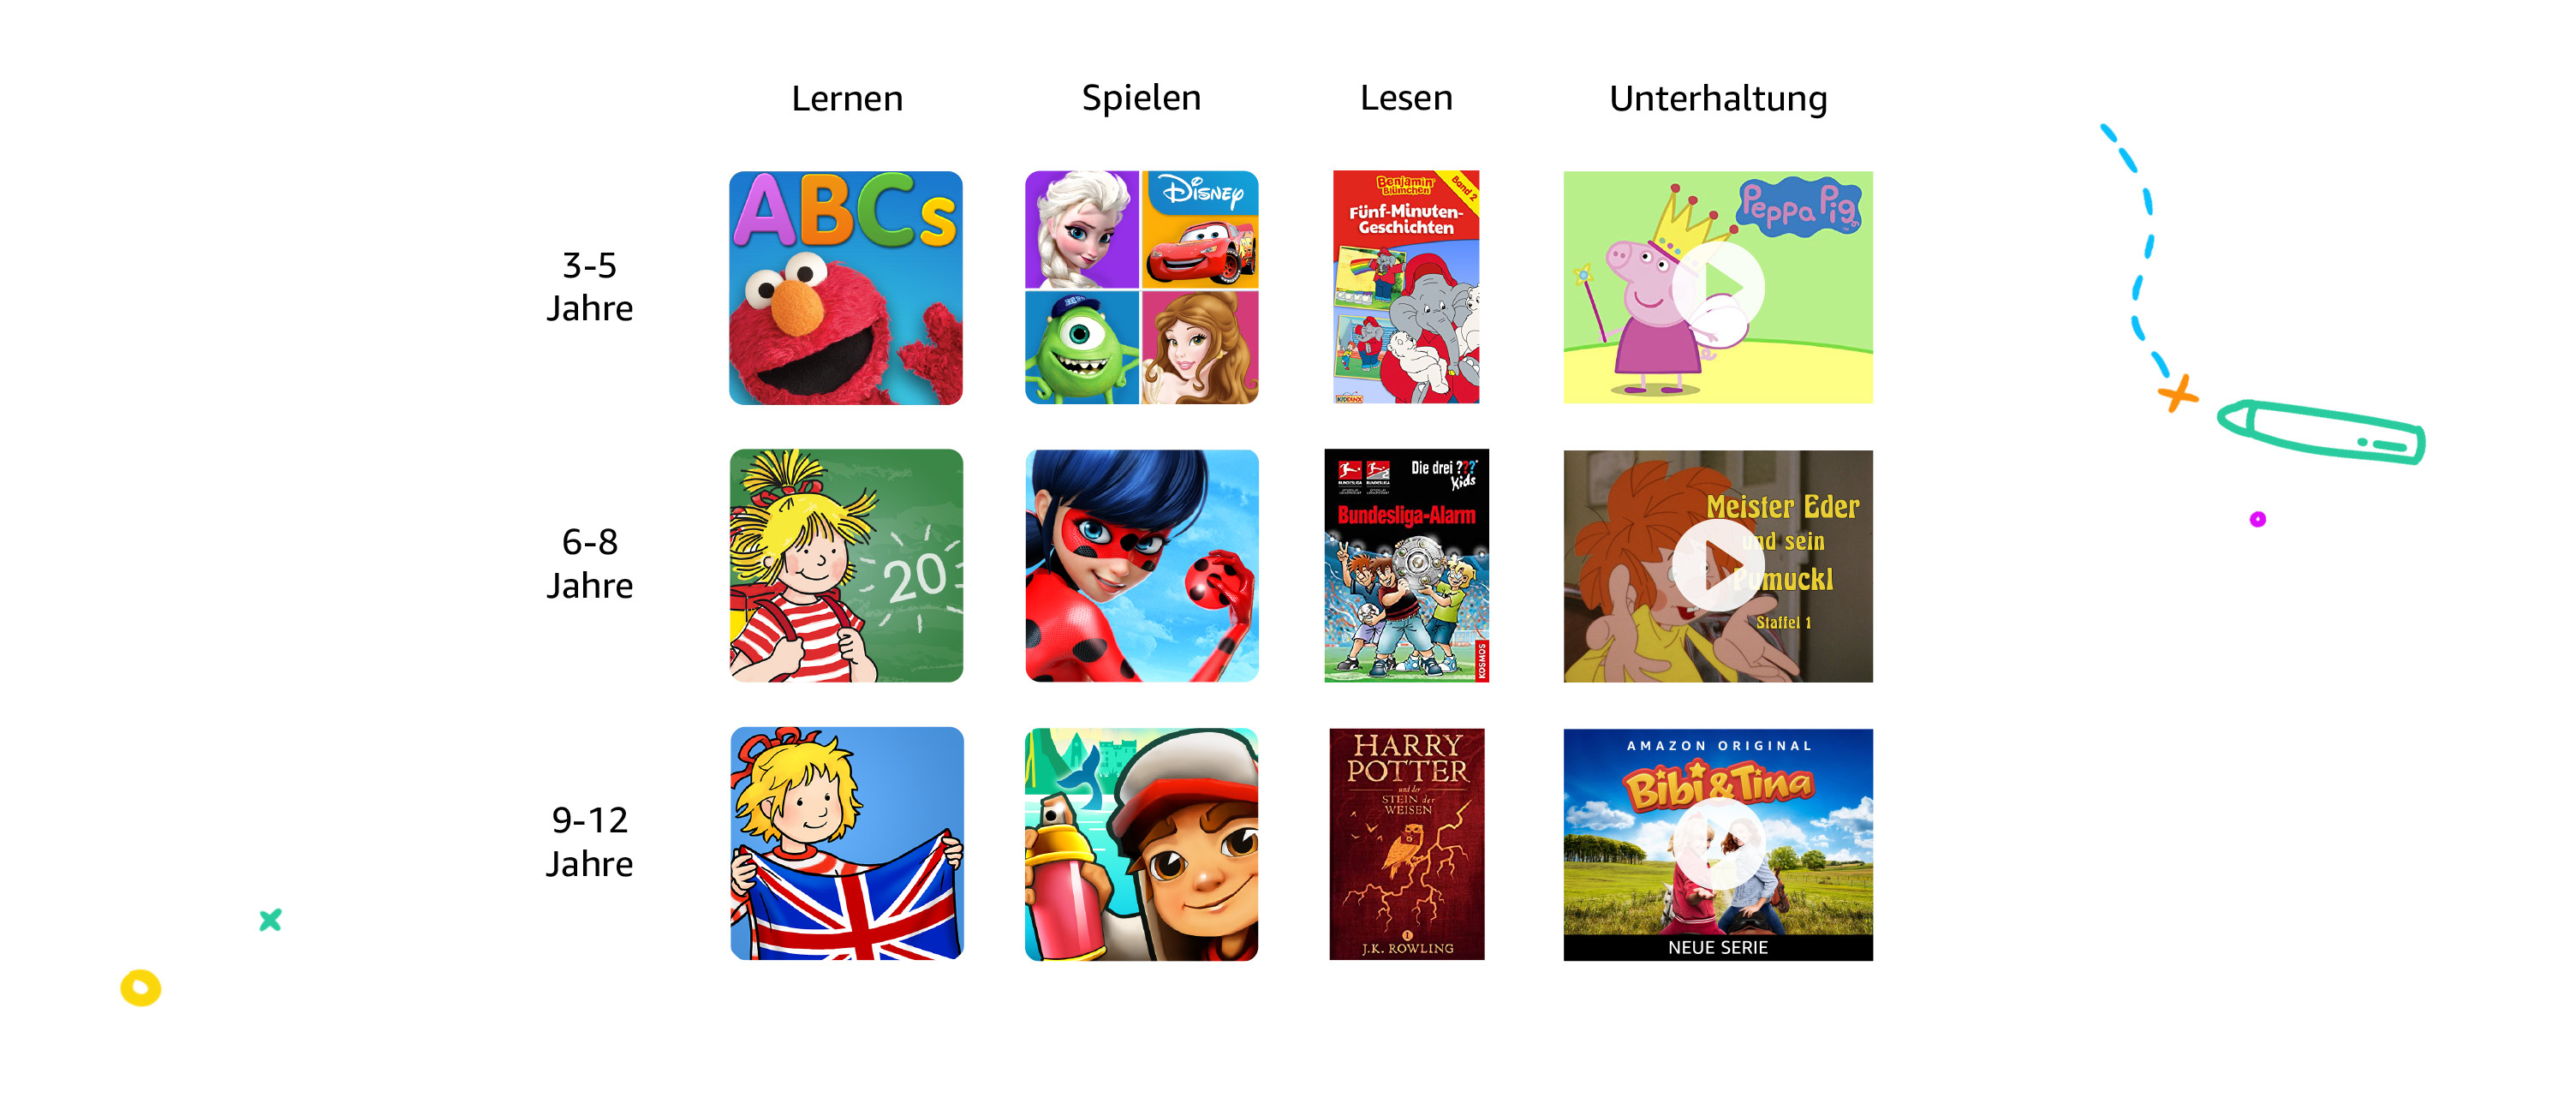 Das Neue Fire Hd 8 Kids Edition Tablet 32 Gb Violette Kindgerechte Hülle Mit Poptime Bluetooth Headset Altersklasse 8 15 Jahre Amazon Devices